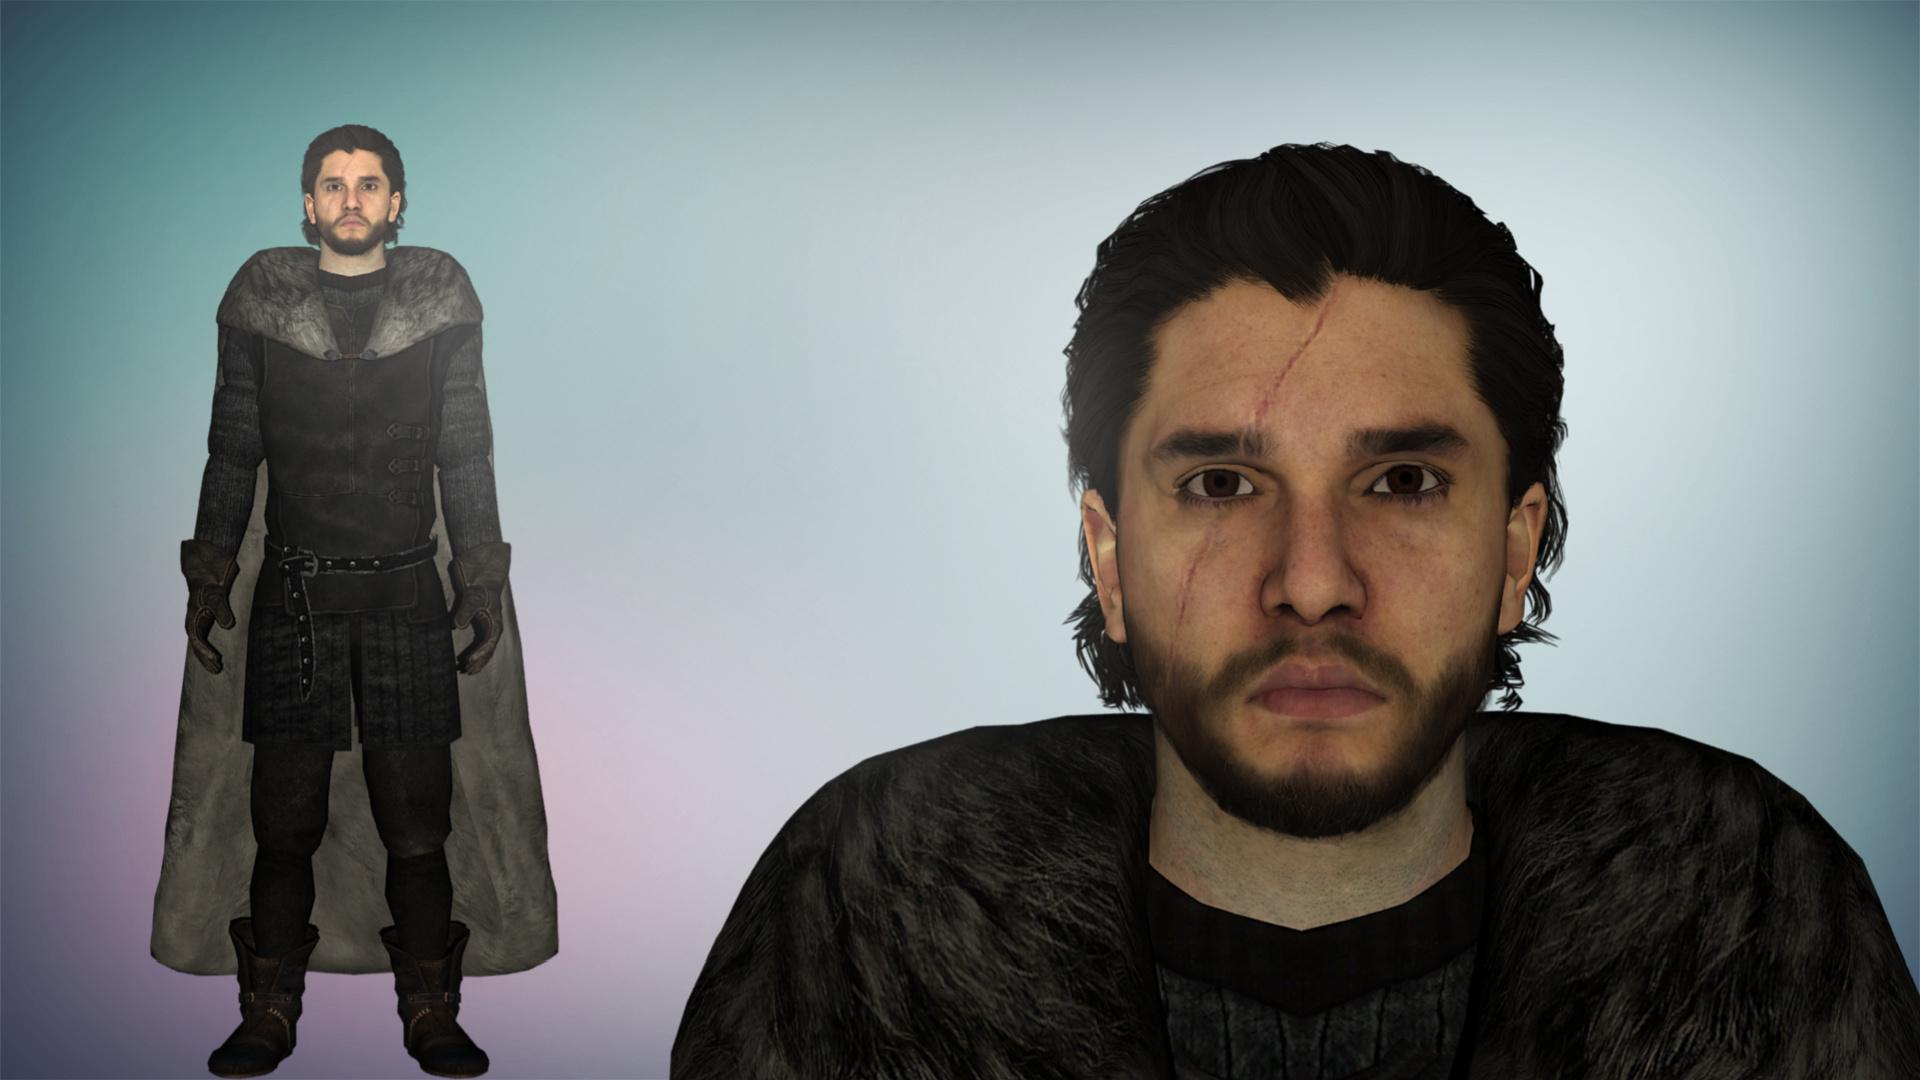 Got Jon Snow Xps Xnalara By Diegoforfun On Deviantart